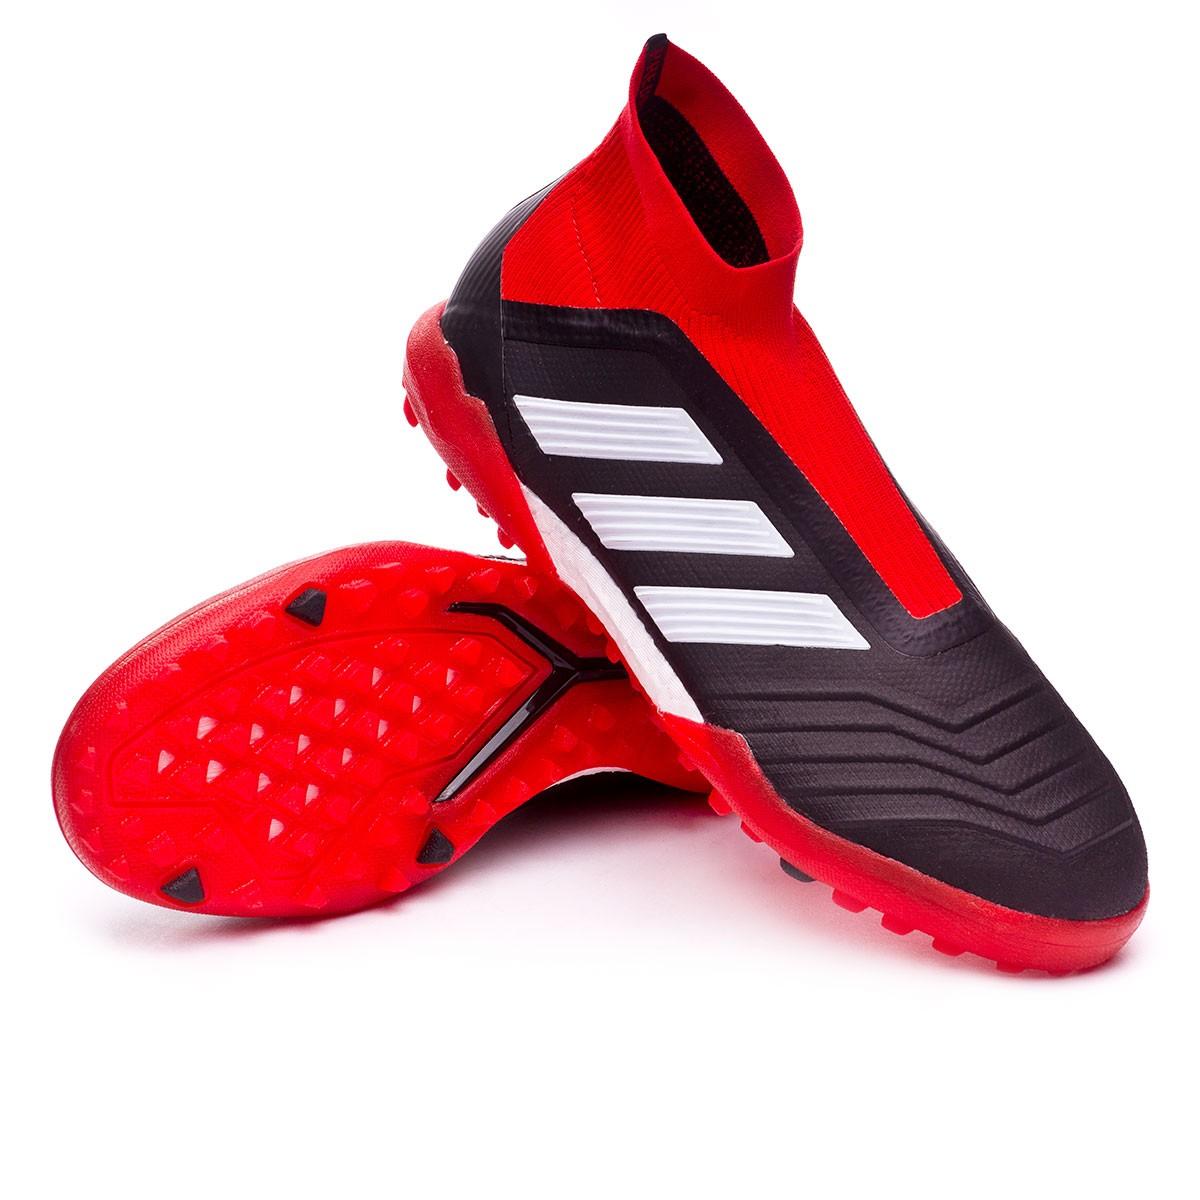 b4d329df46cf Football Boot adidas Predator Tango 18+ Turf Core black-White-Red ...